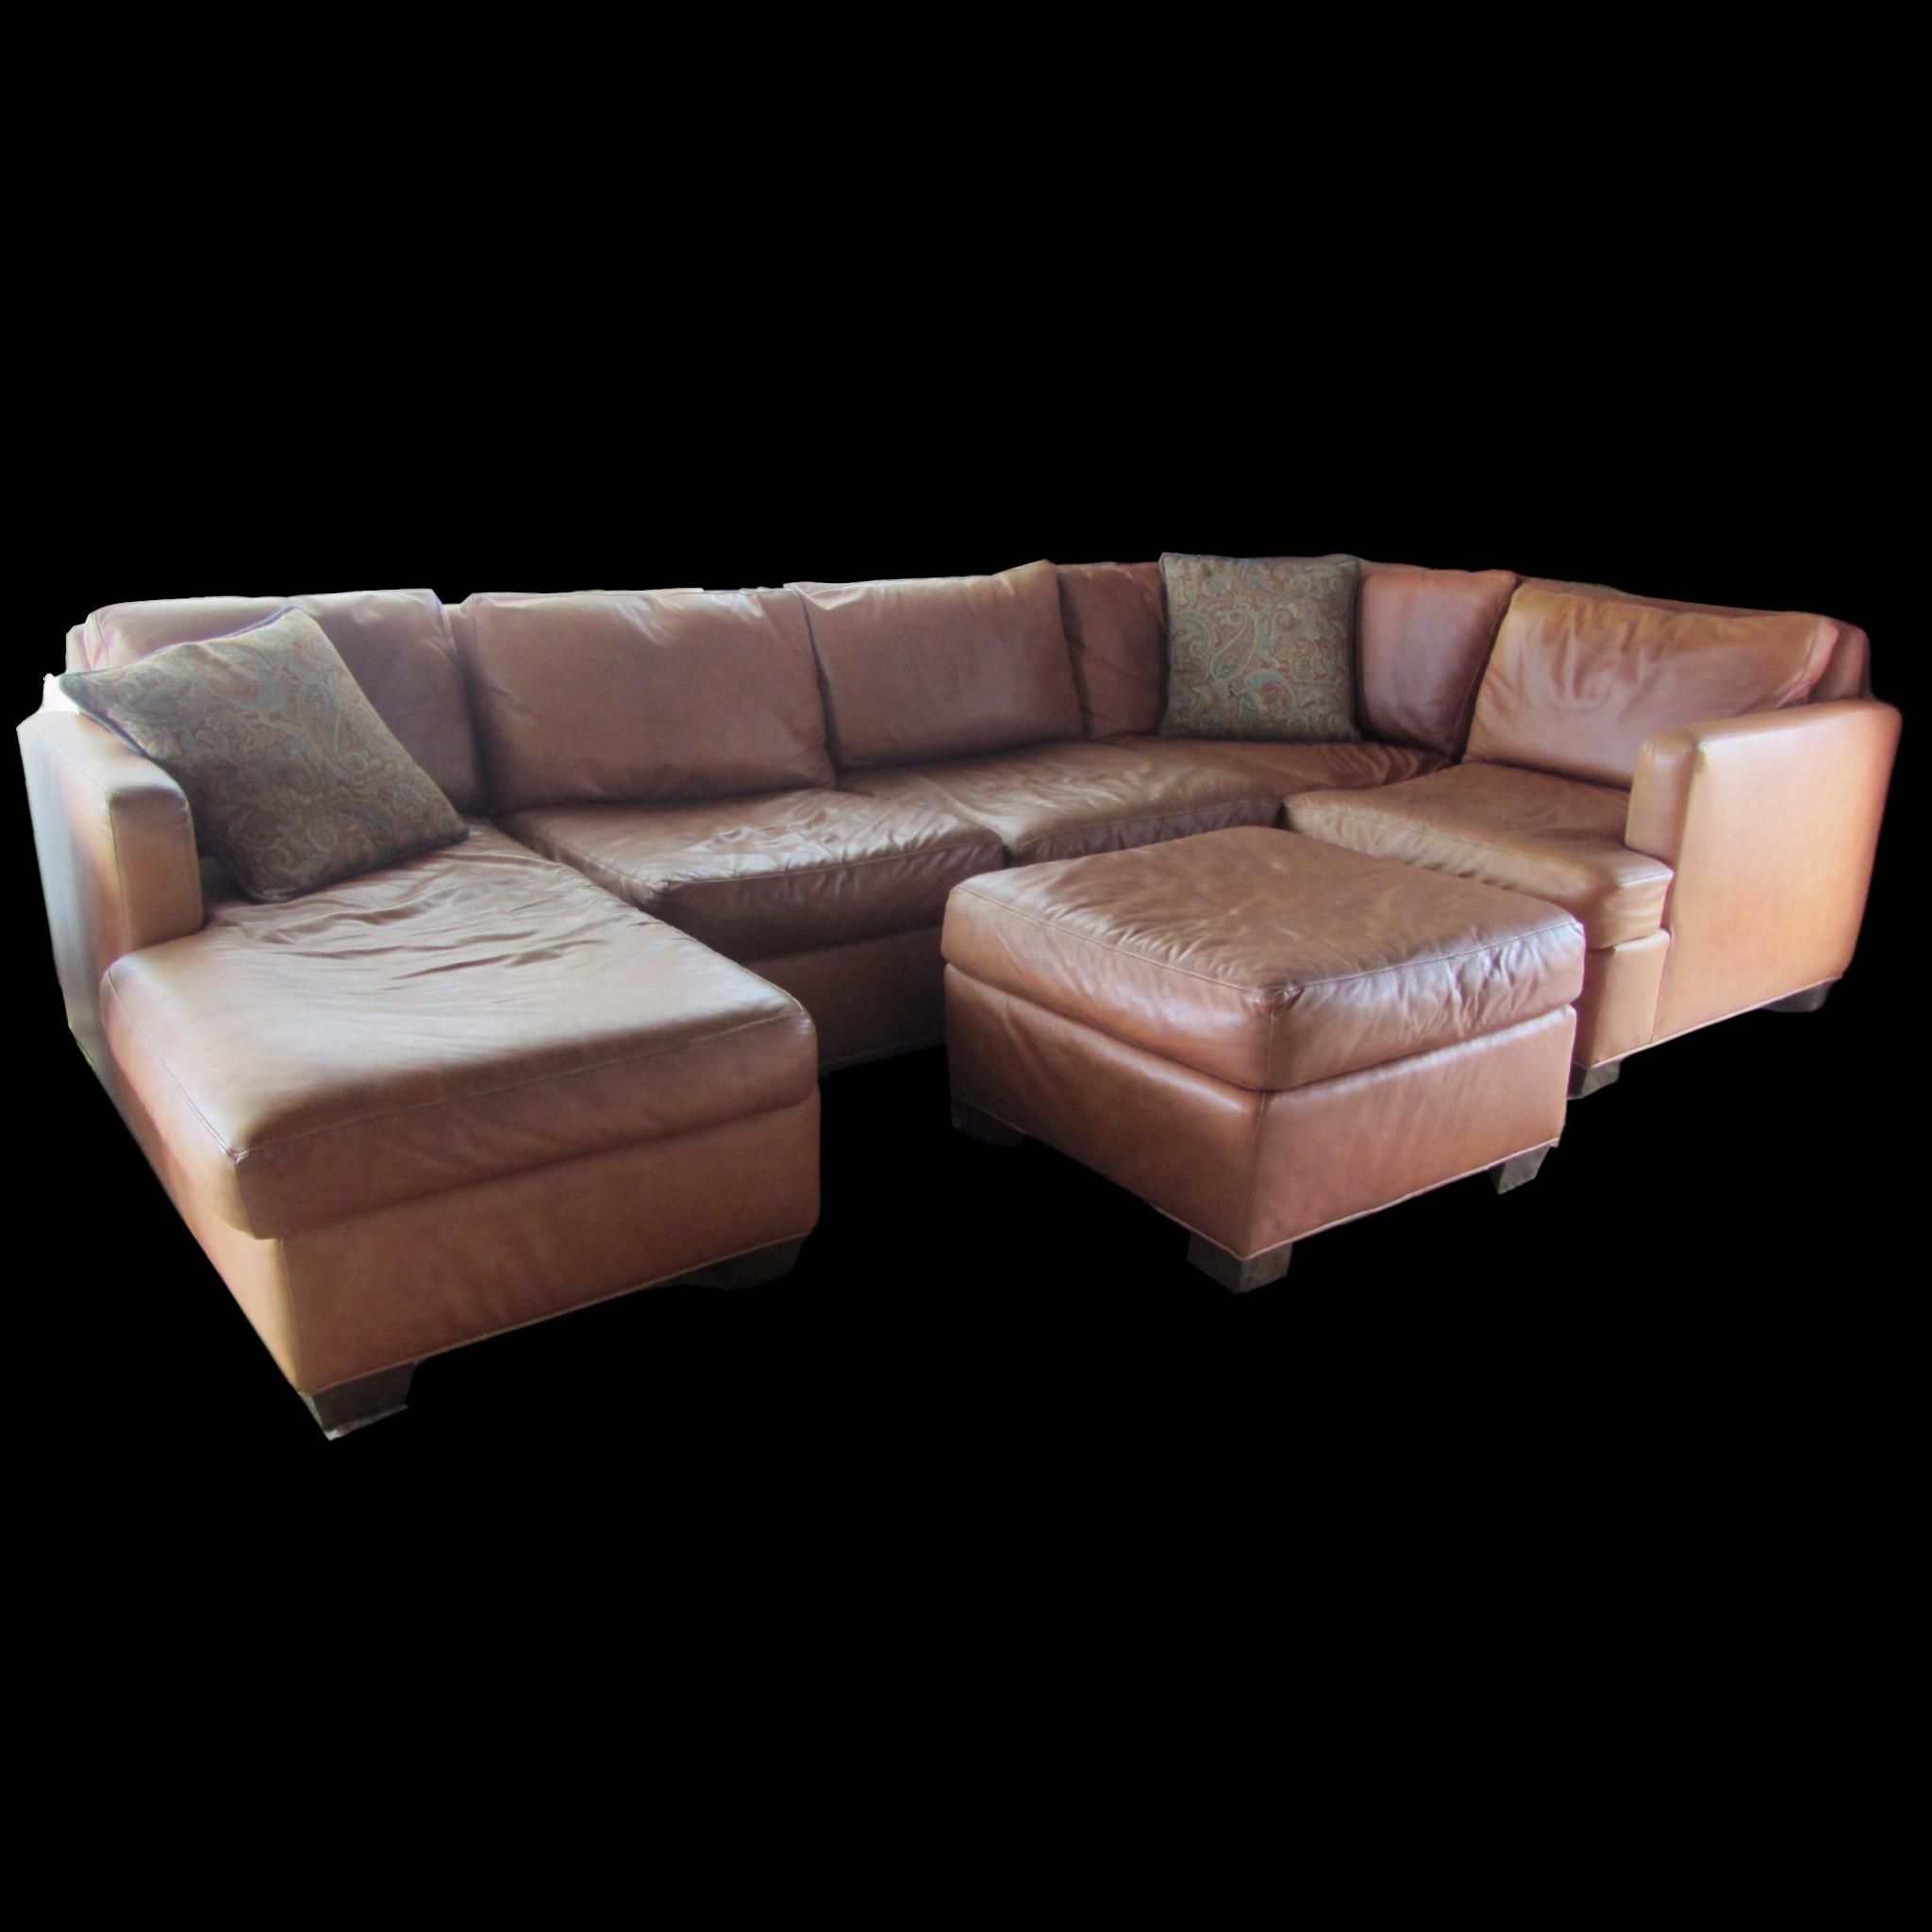 Custom Saddle Leather Sectional & Ottoman $2998 00